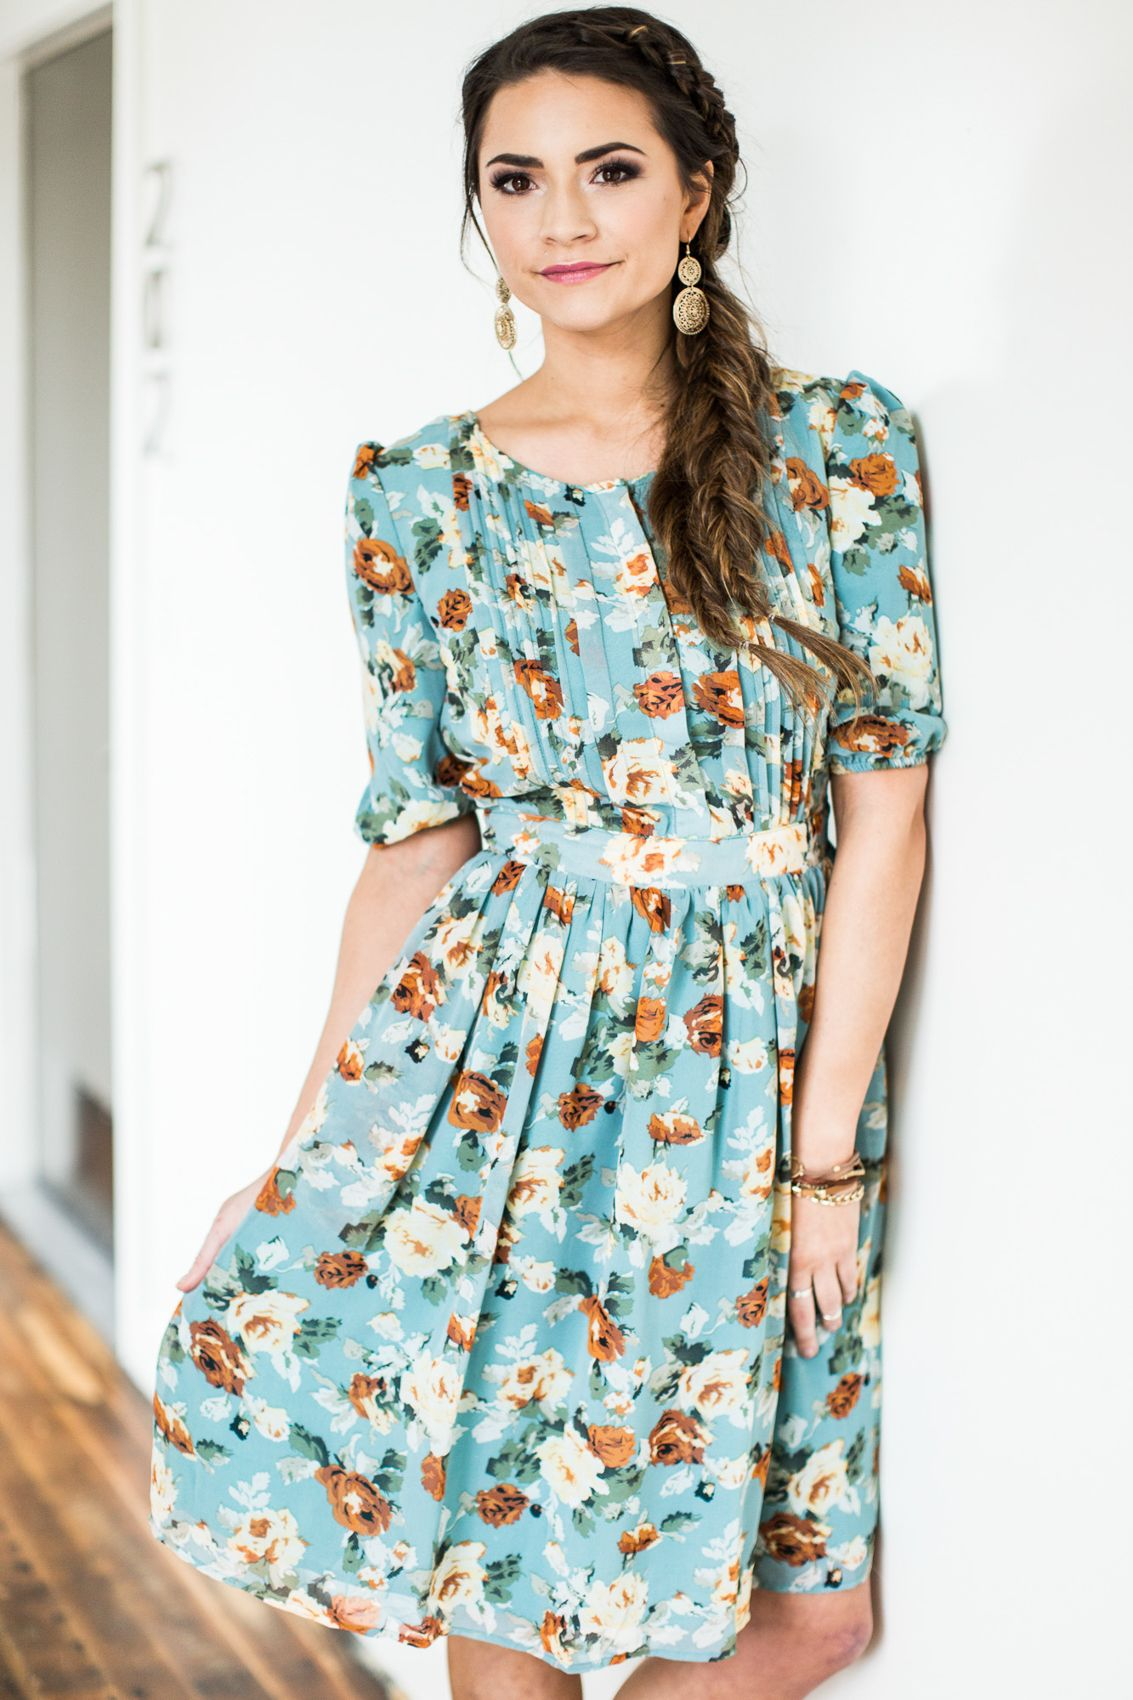 Modest Nursing Dresses